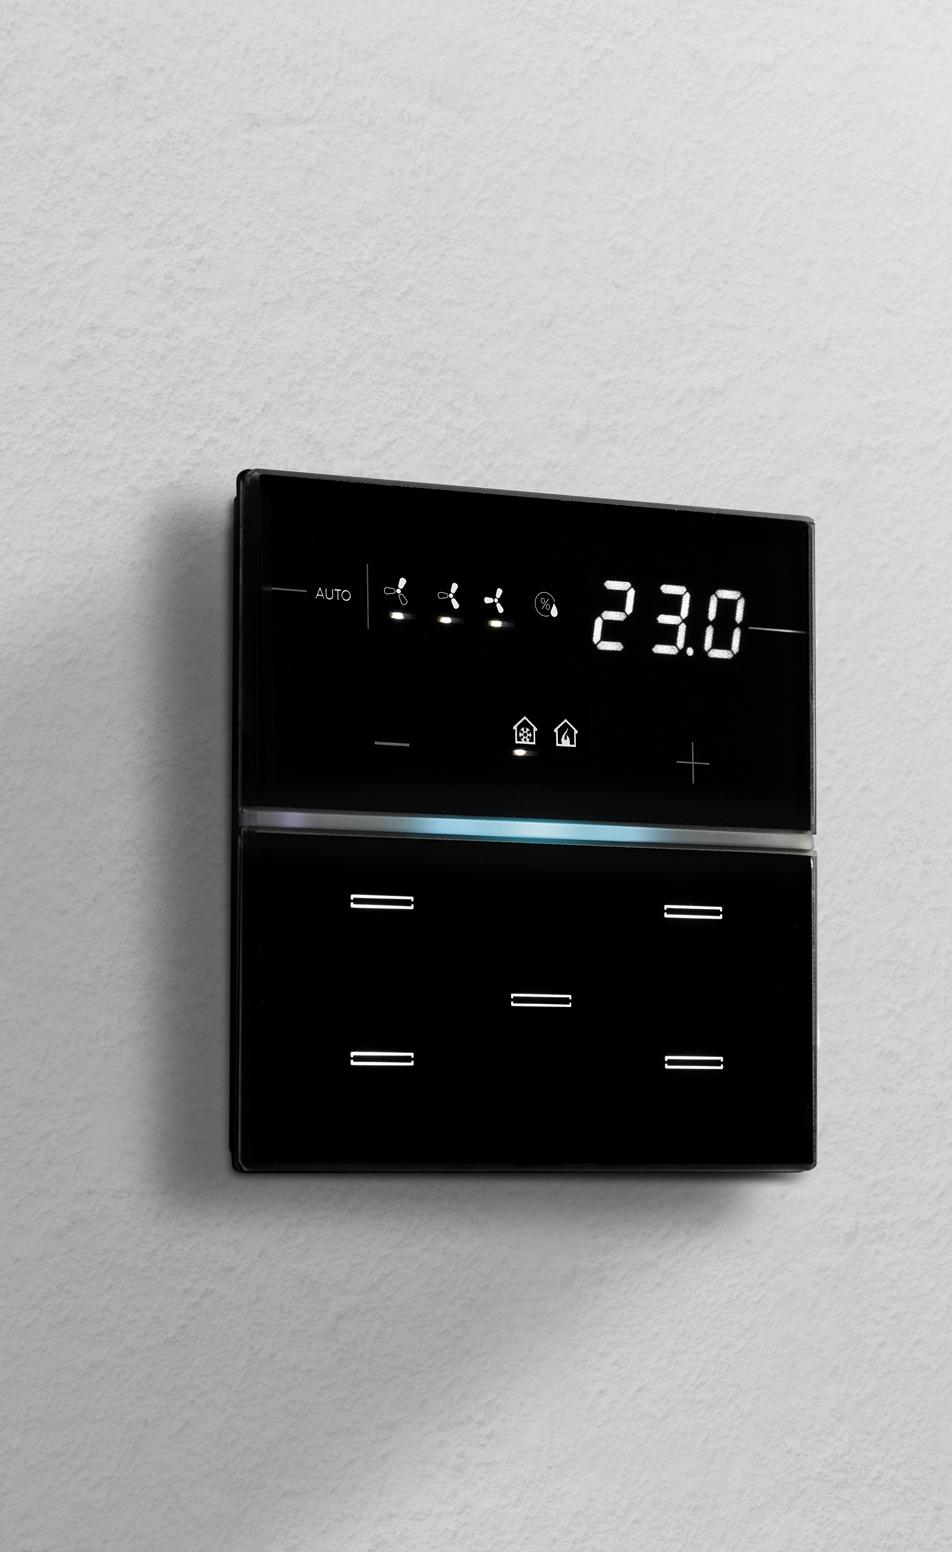 Thermostat_Hotel_Black20350_